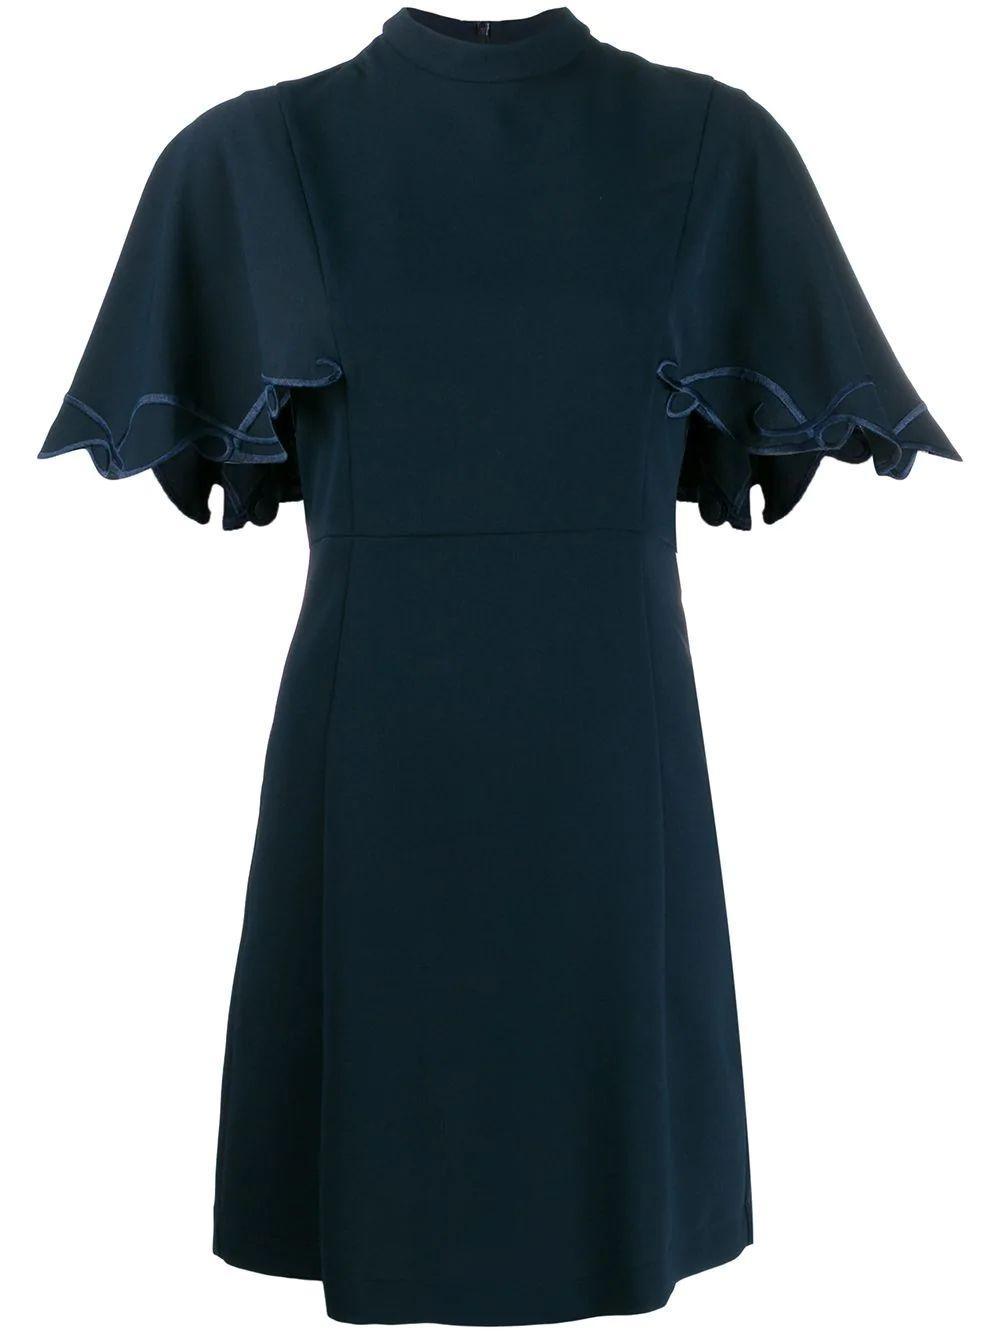 Mock Neck Shift Dress With Ruffle Sleeve Item # CHS19ARO15012